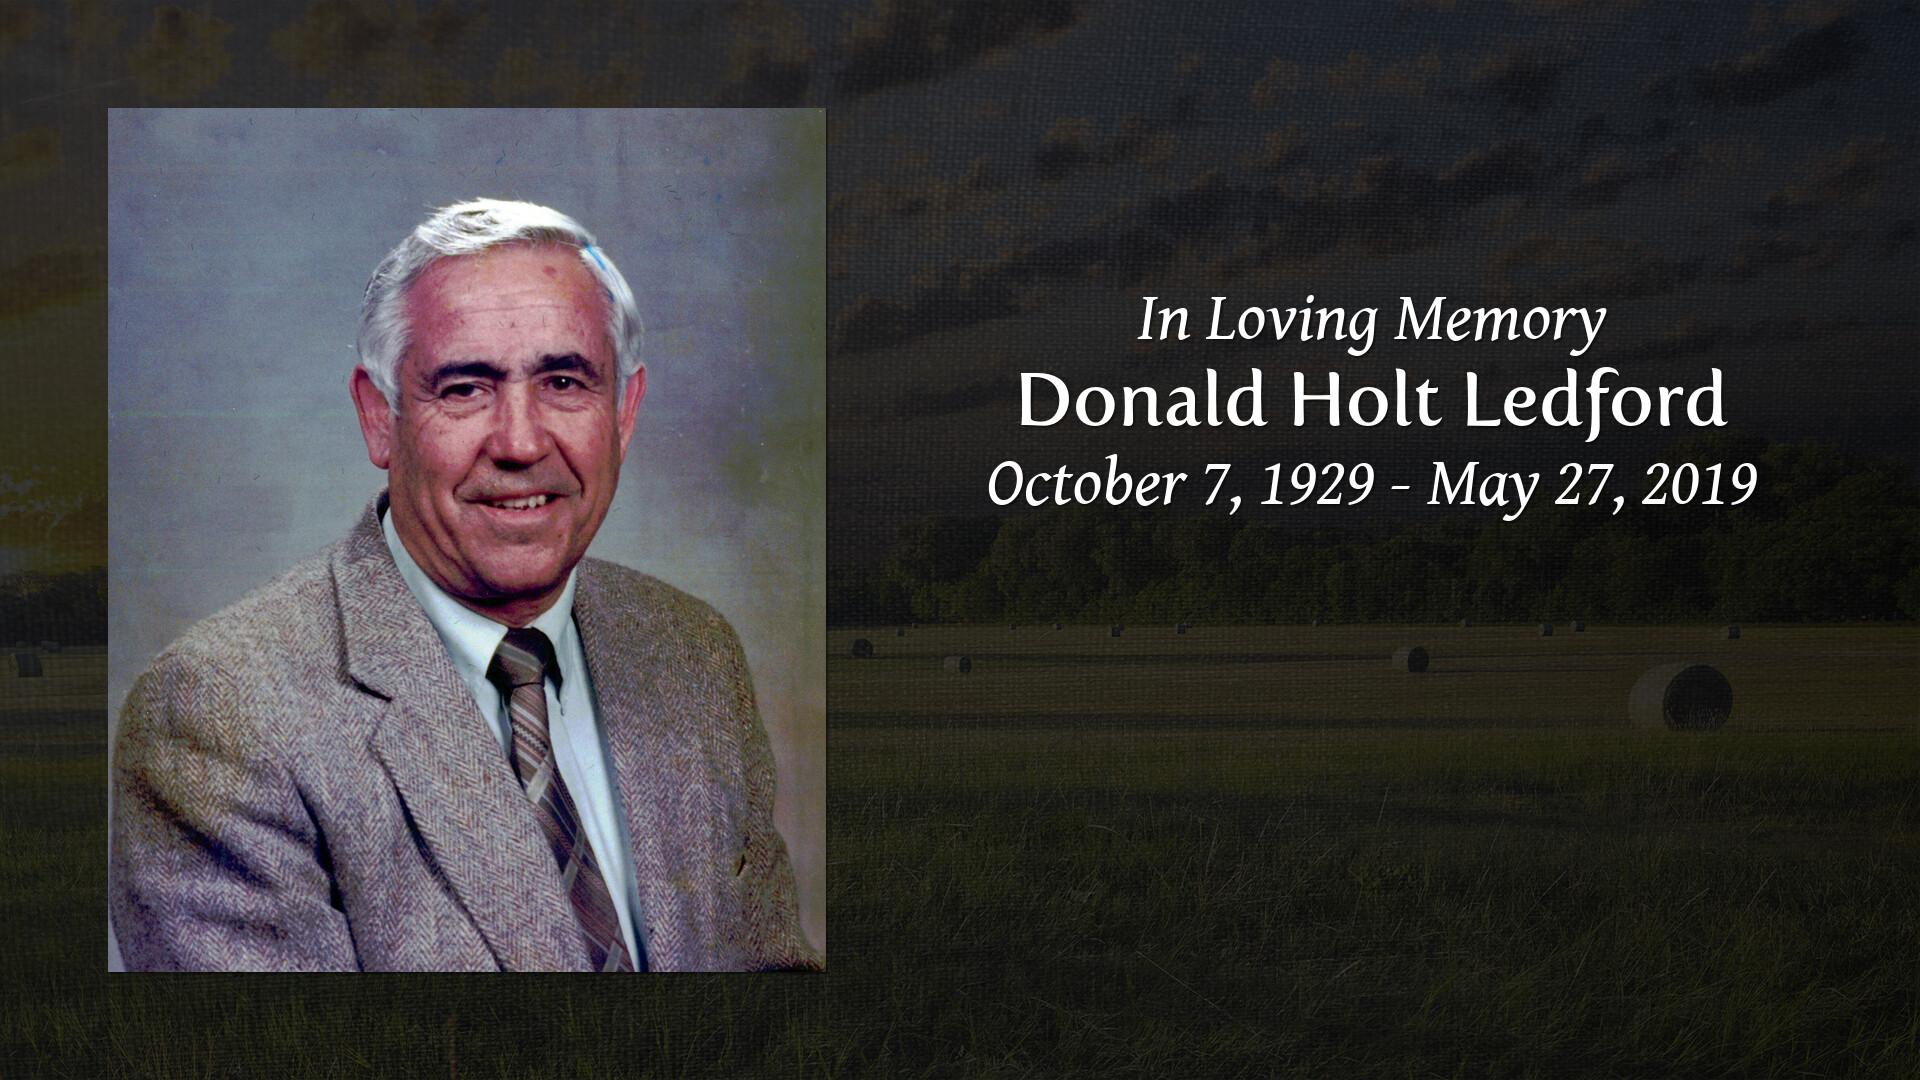 Don Ledford Athens Tn >> In Memory Of Donald Holt Ledford Ralph Buckner Funeral Home